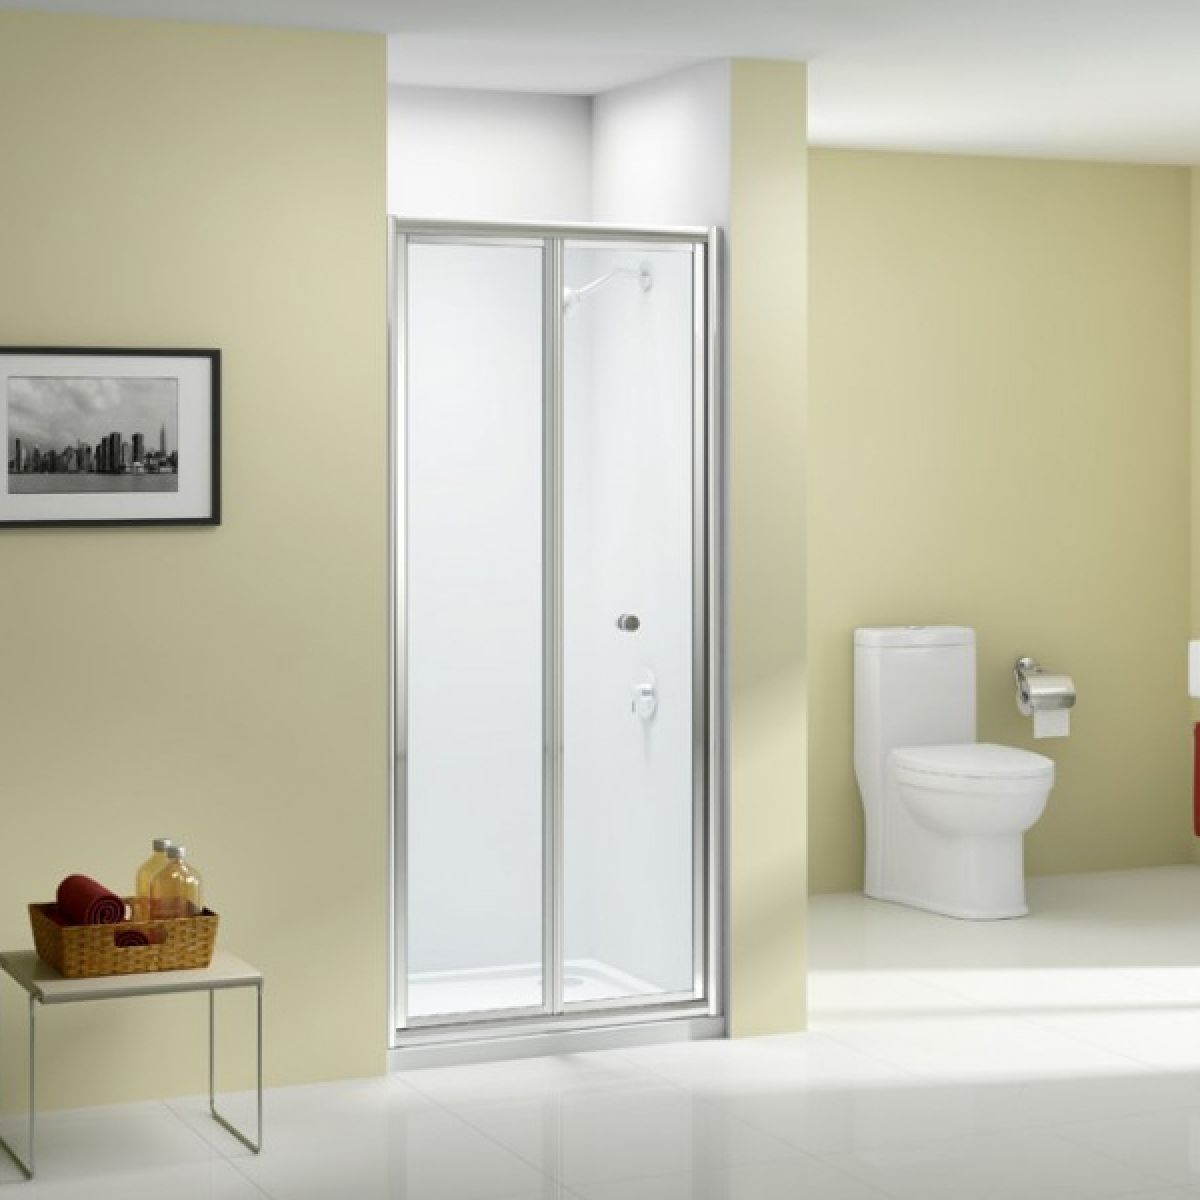 Merlyn Ionic Source Bifold Shower Door with Optional Side Panel